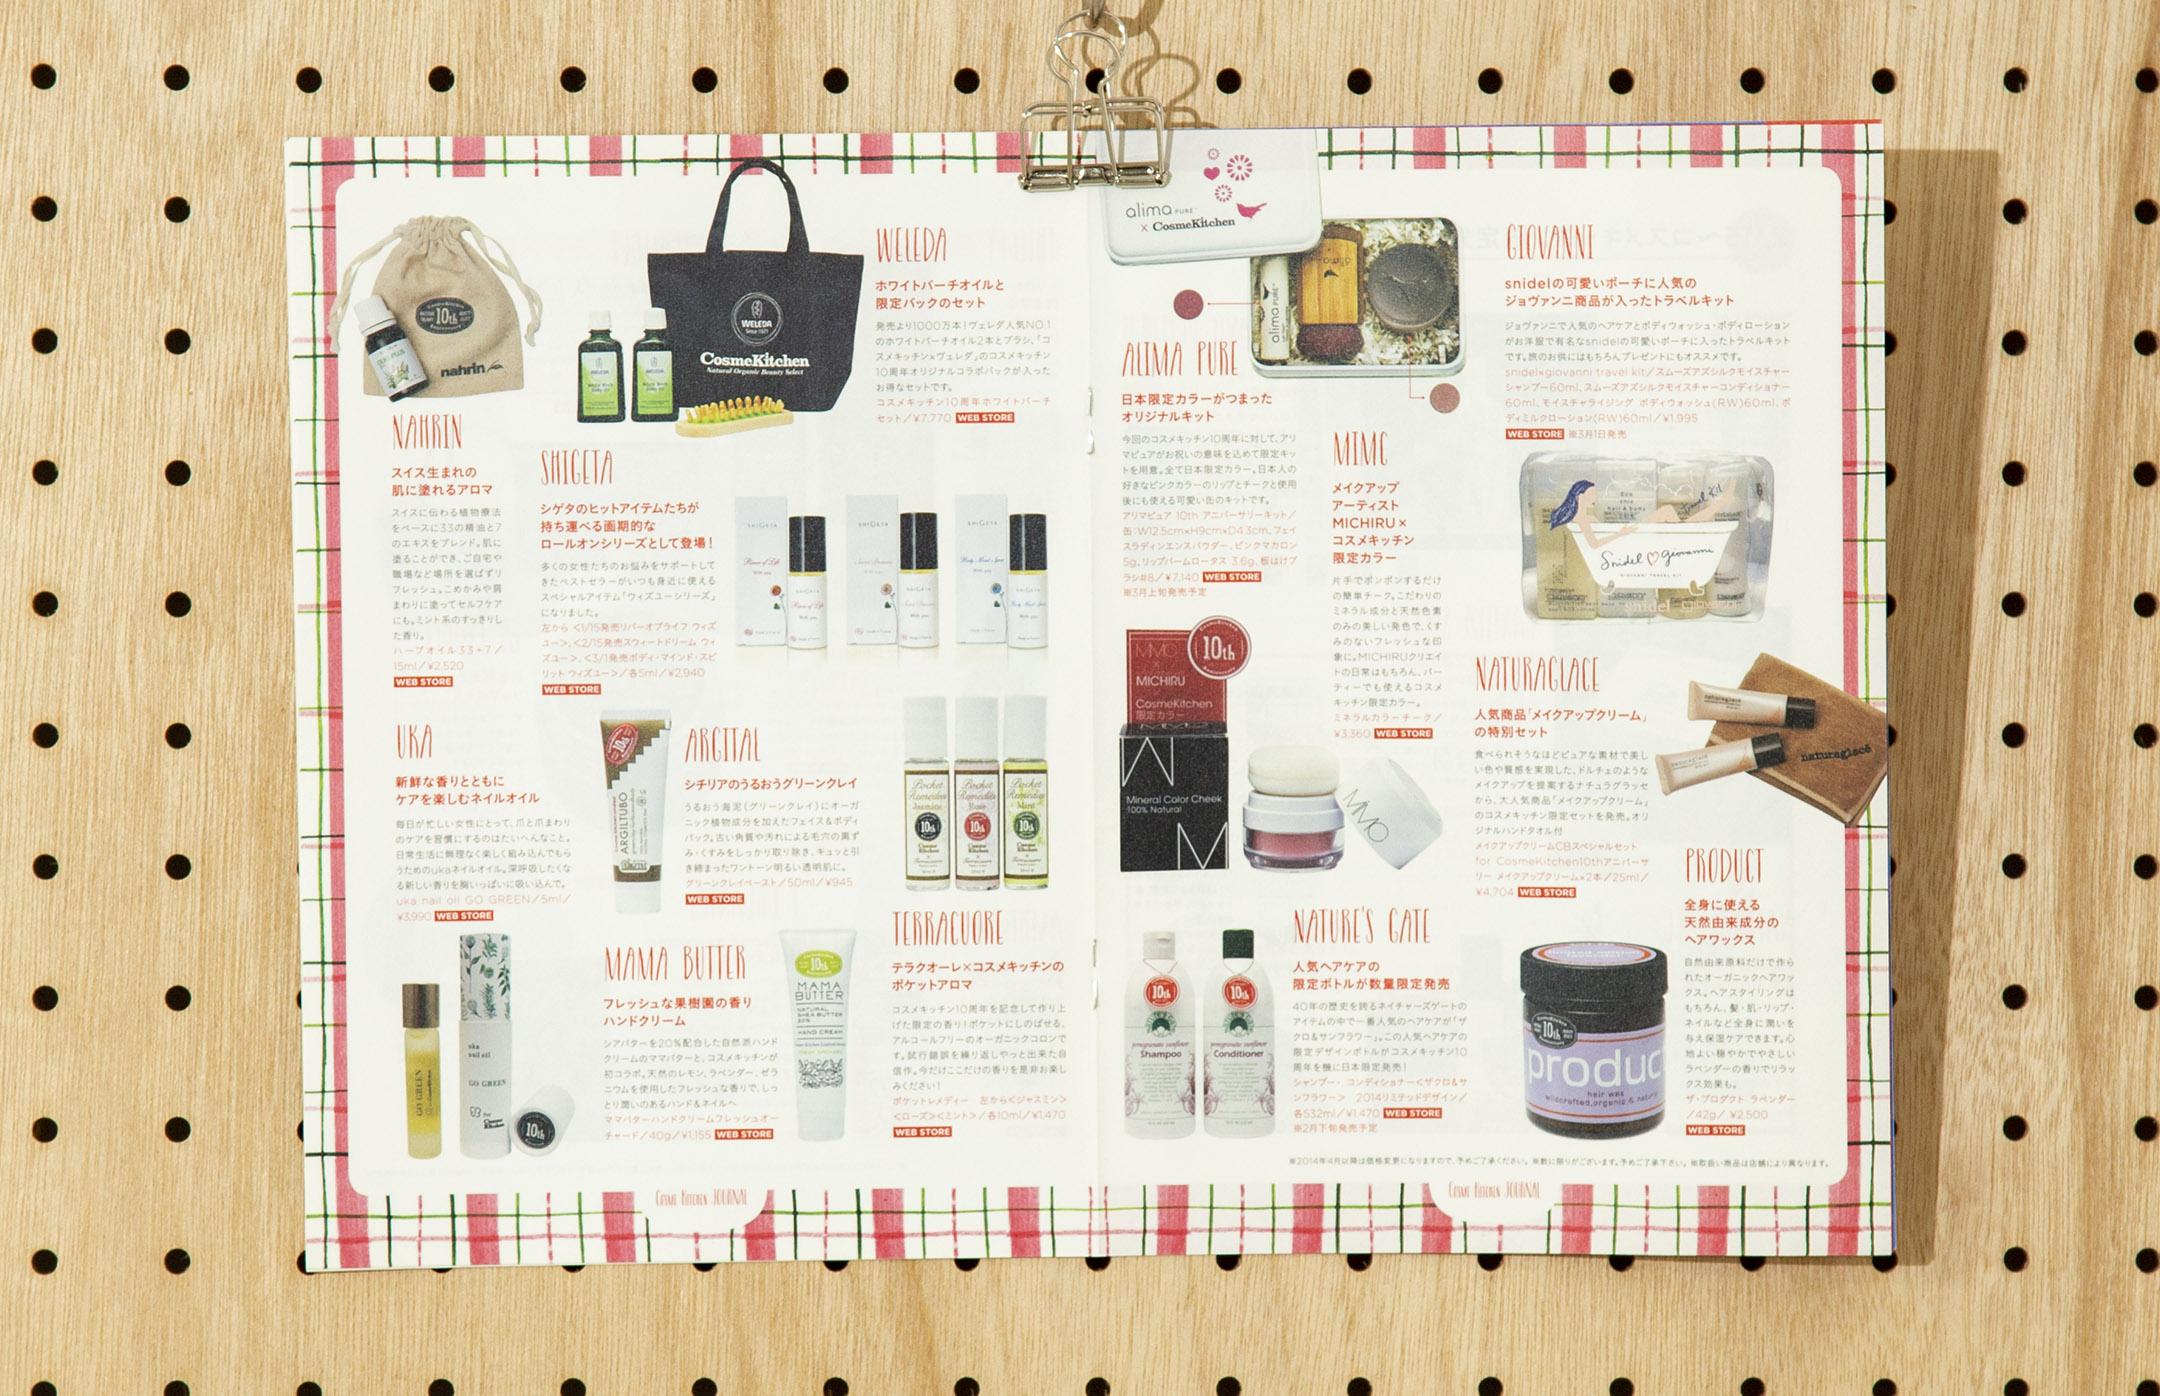 soda design COSME KITCHEN JOURNAL 10th ANNIVERSARYArt Direction & Design: Yusuke Shibata